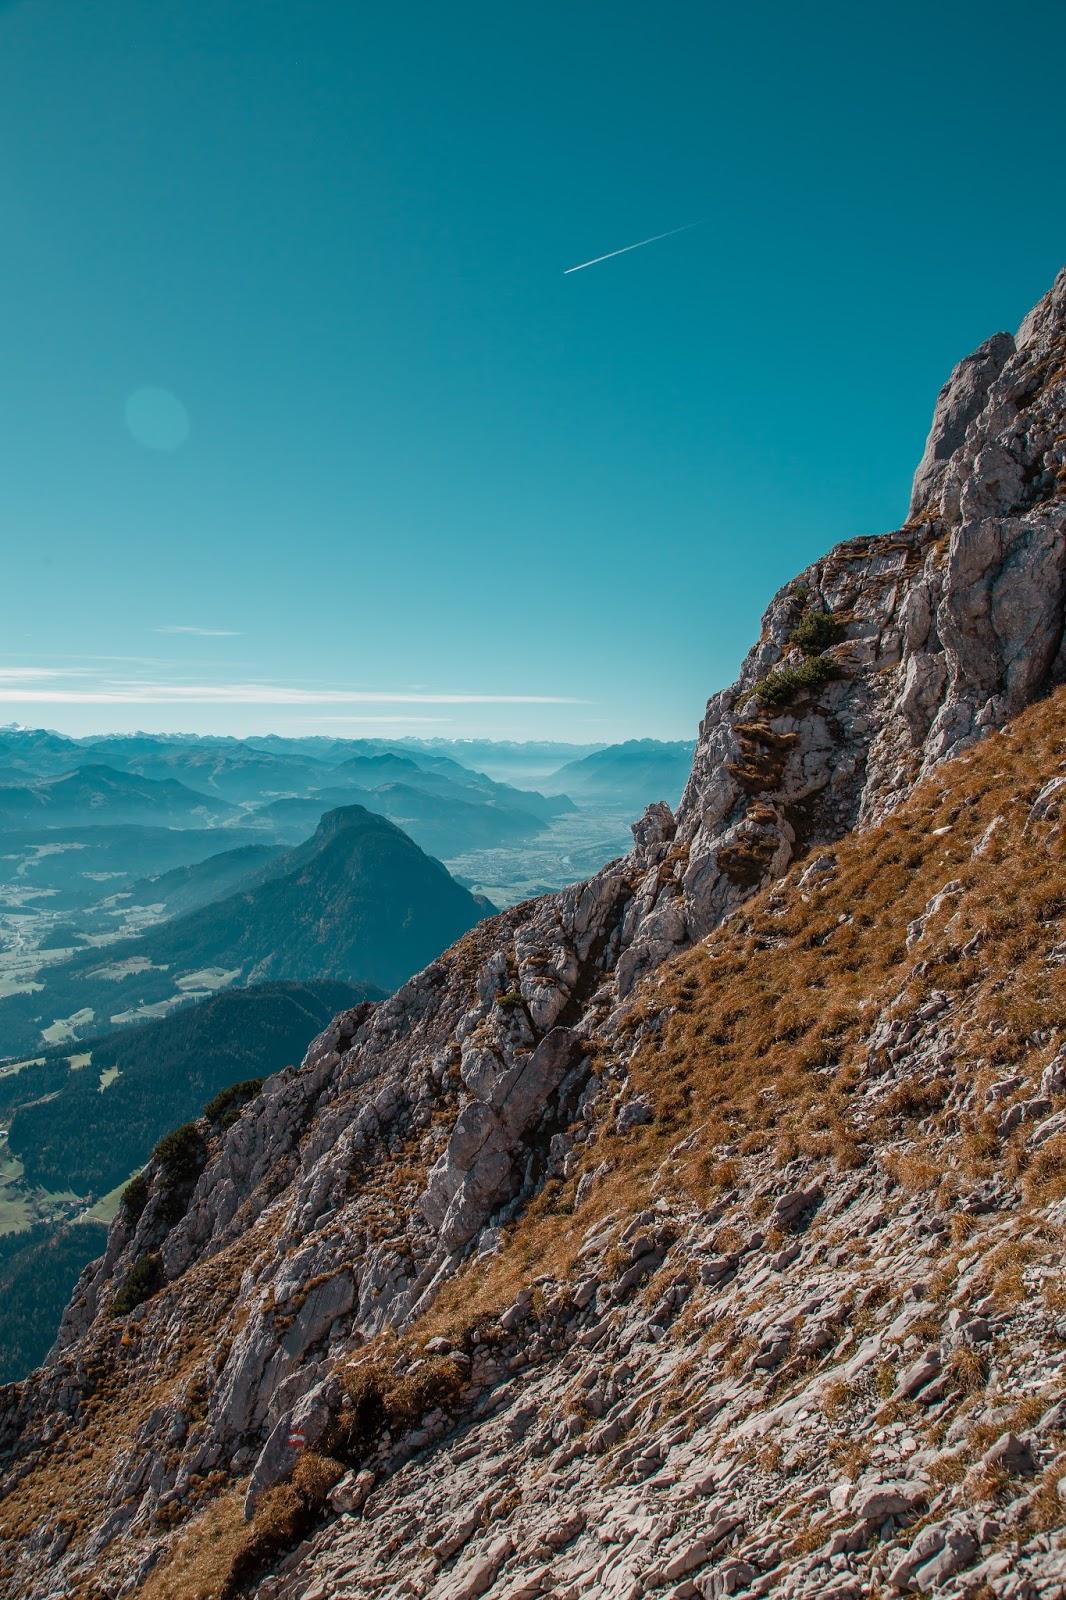 Bergtour Scheffauer  Wandern Wilder Kaiser  leichter Gipfel im Wilden Kaiser  Wandern-Tirol 15